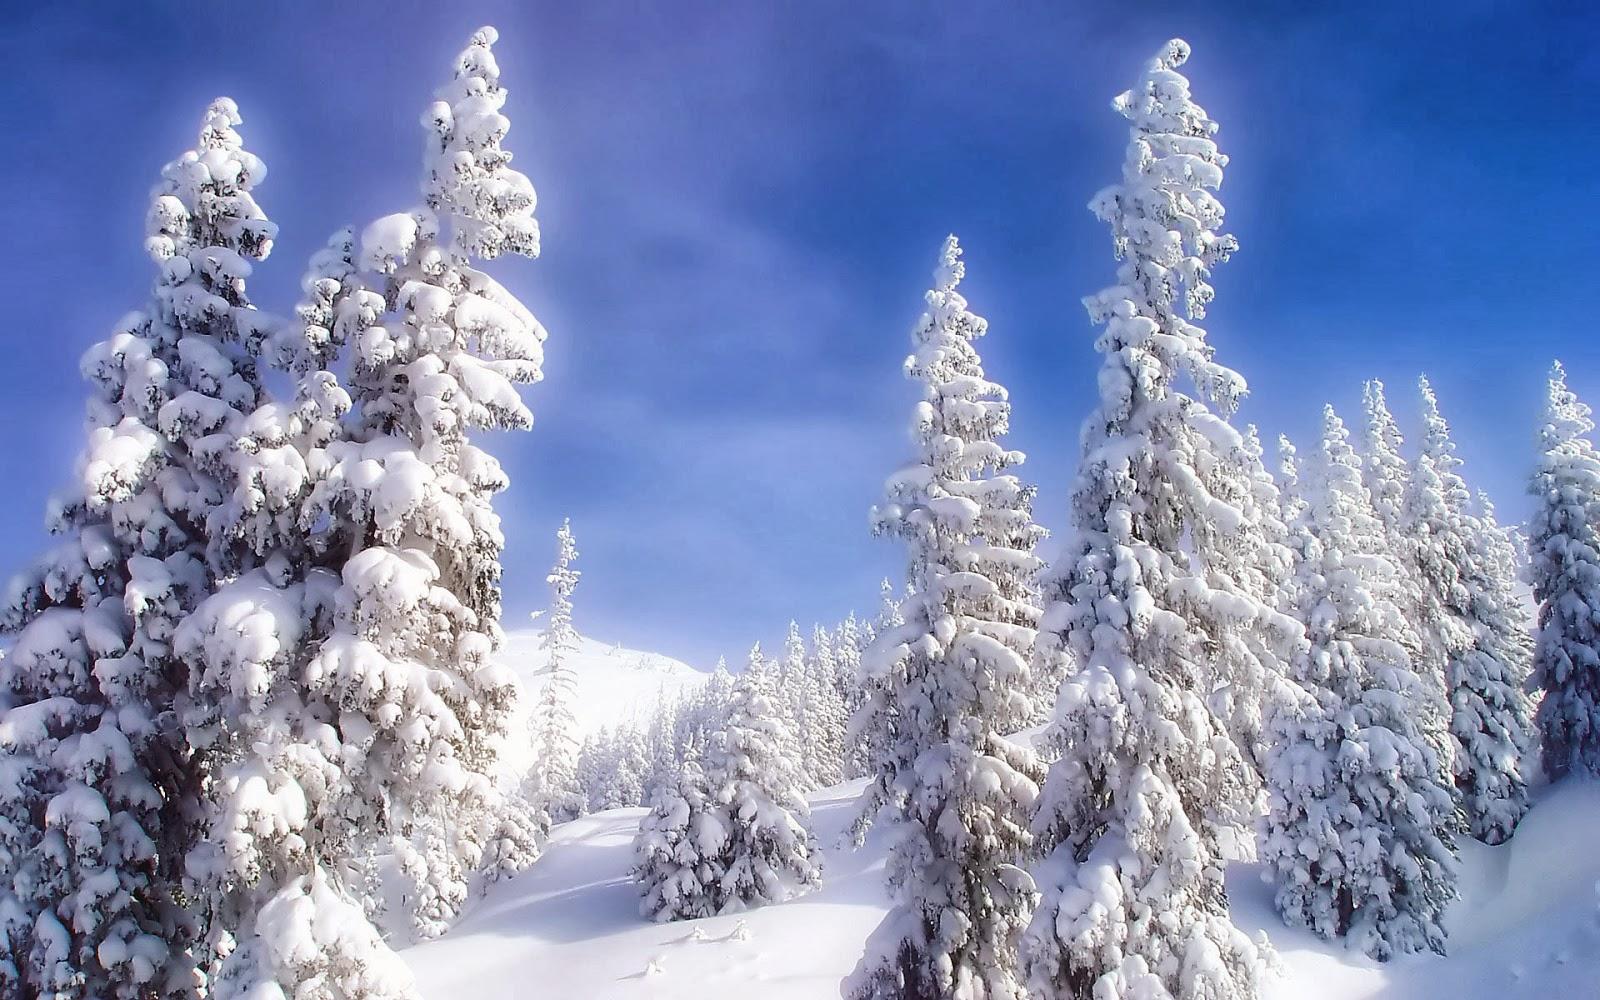 Missing Beats Of Life: Winter Season HD Wallpaper